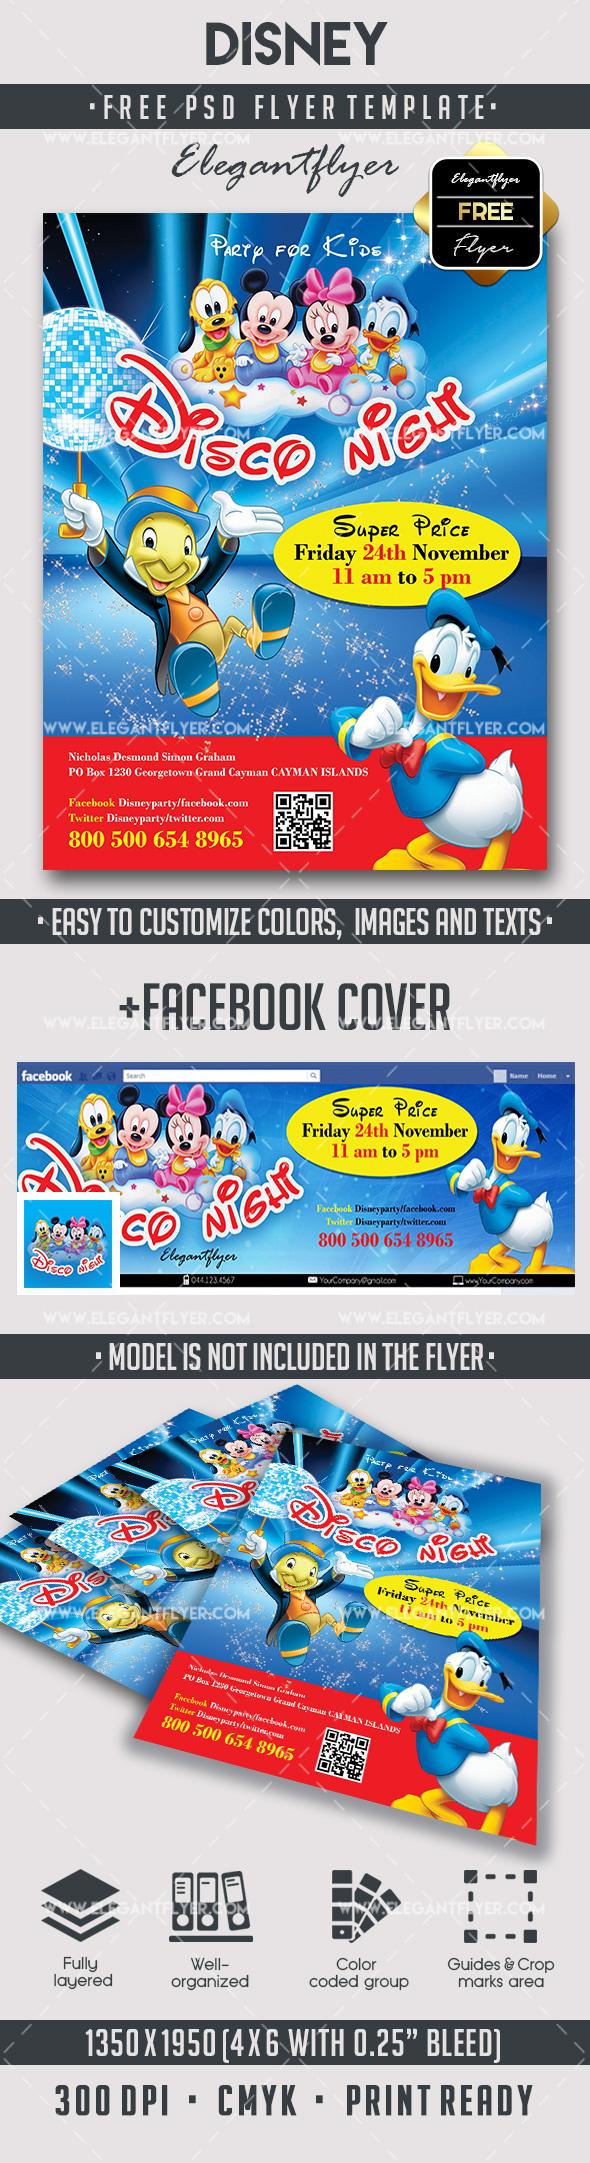 Disney Free Flyer Psd Template Facebook Cover By Elegantflyer Free Psd Flyer Free Flyer Templates Flyer